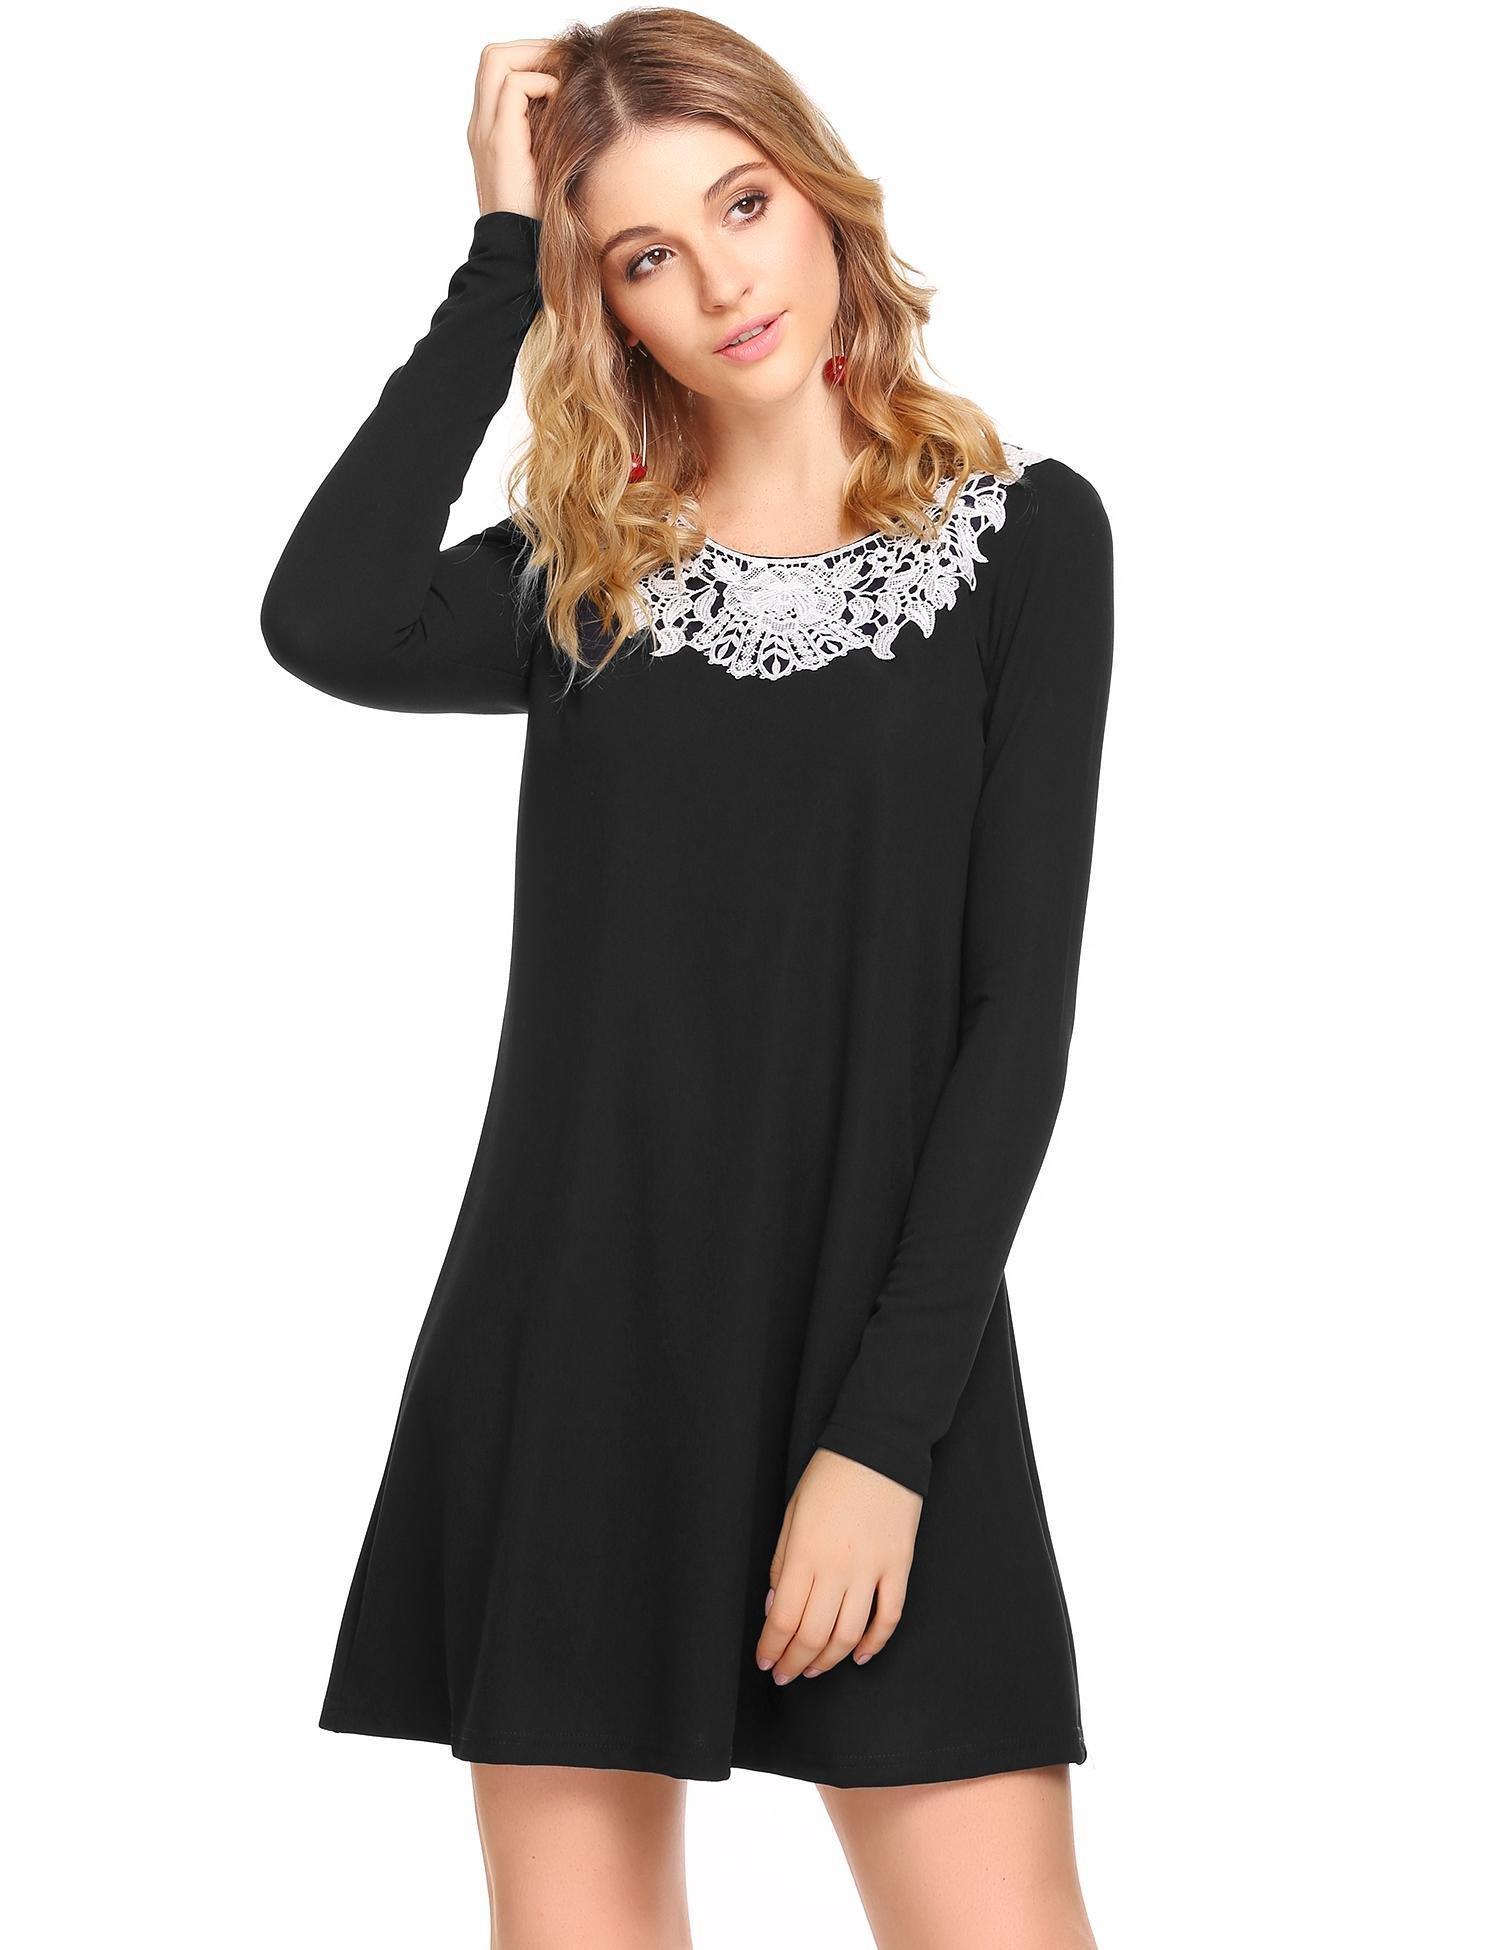 Zeagoo Women's Long Sleeve Shirt Lace Casual Loose Swing Dress Black XL